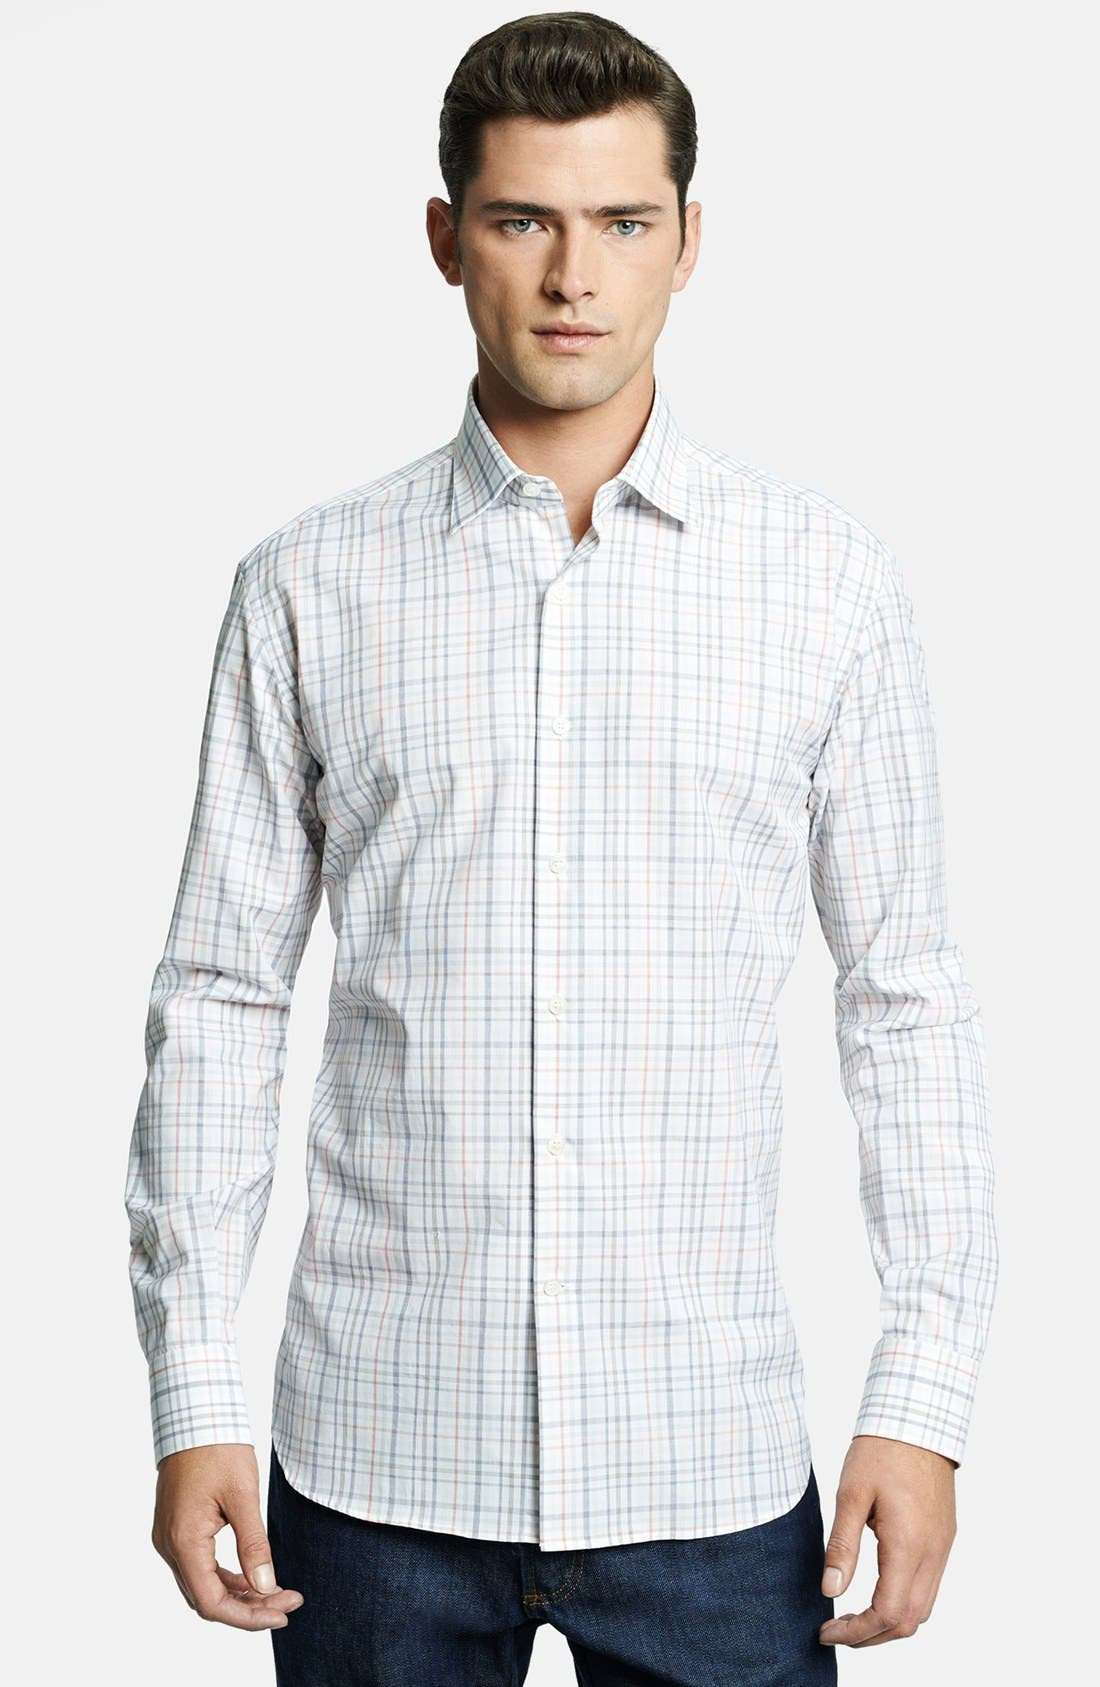 Alternate Image 1 Selected - Salvatore Ferragamo Trim Fit Plaid Sport Shirt